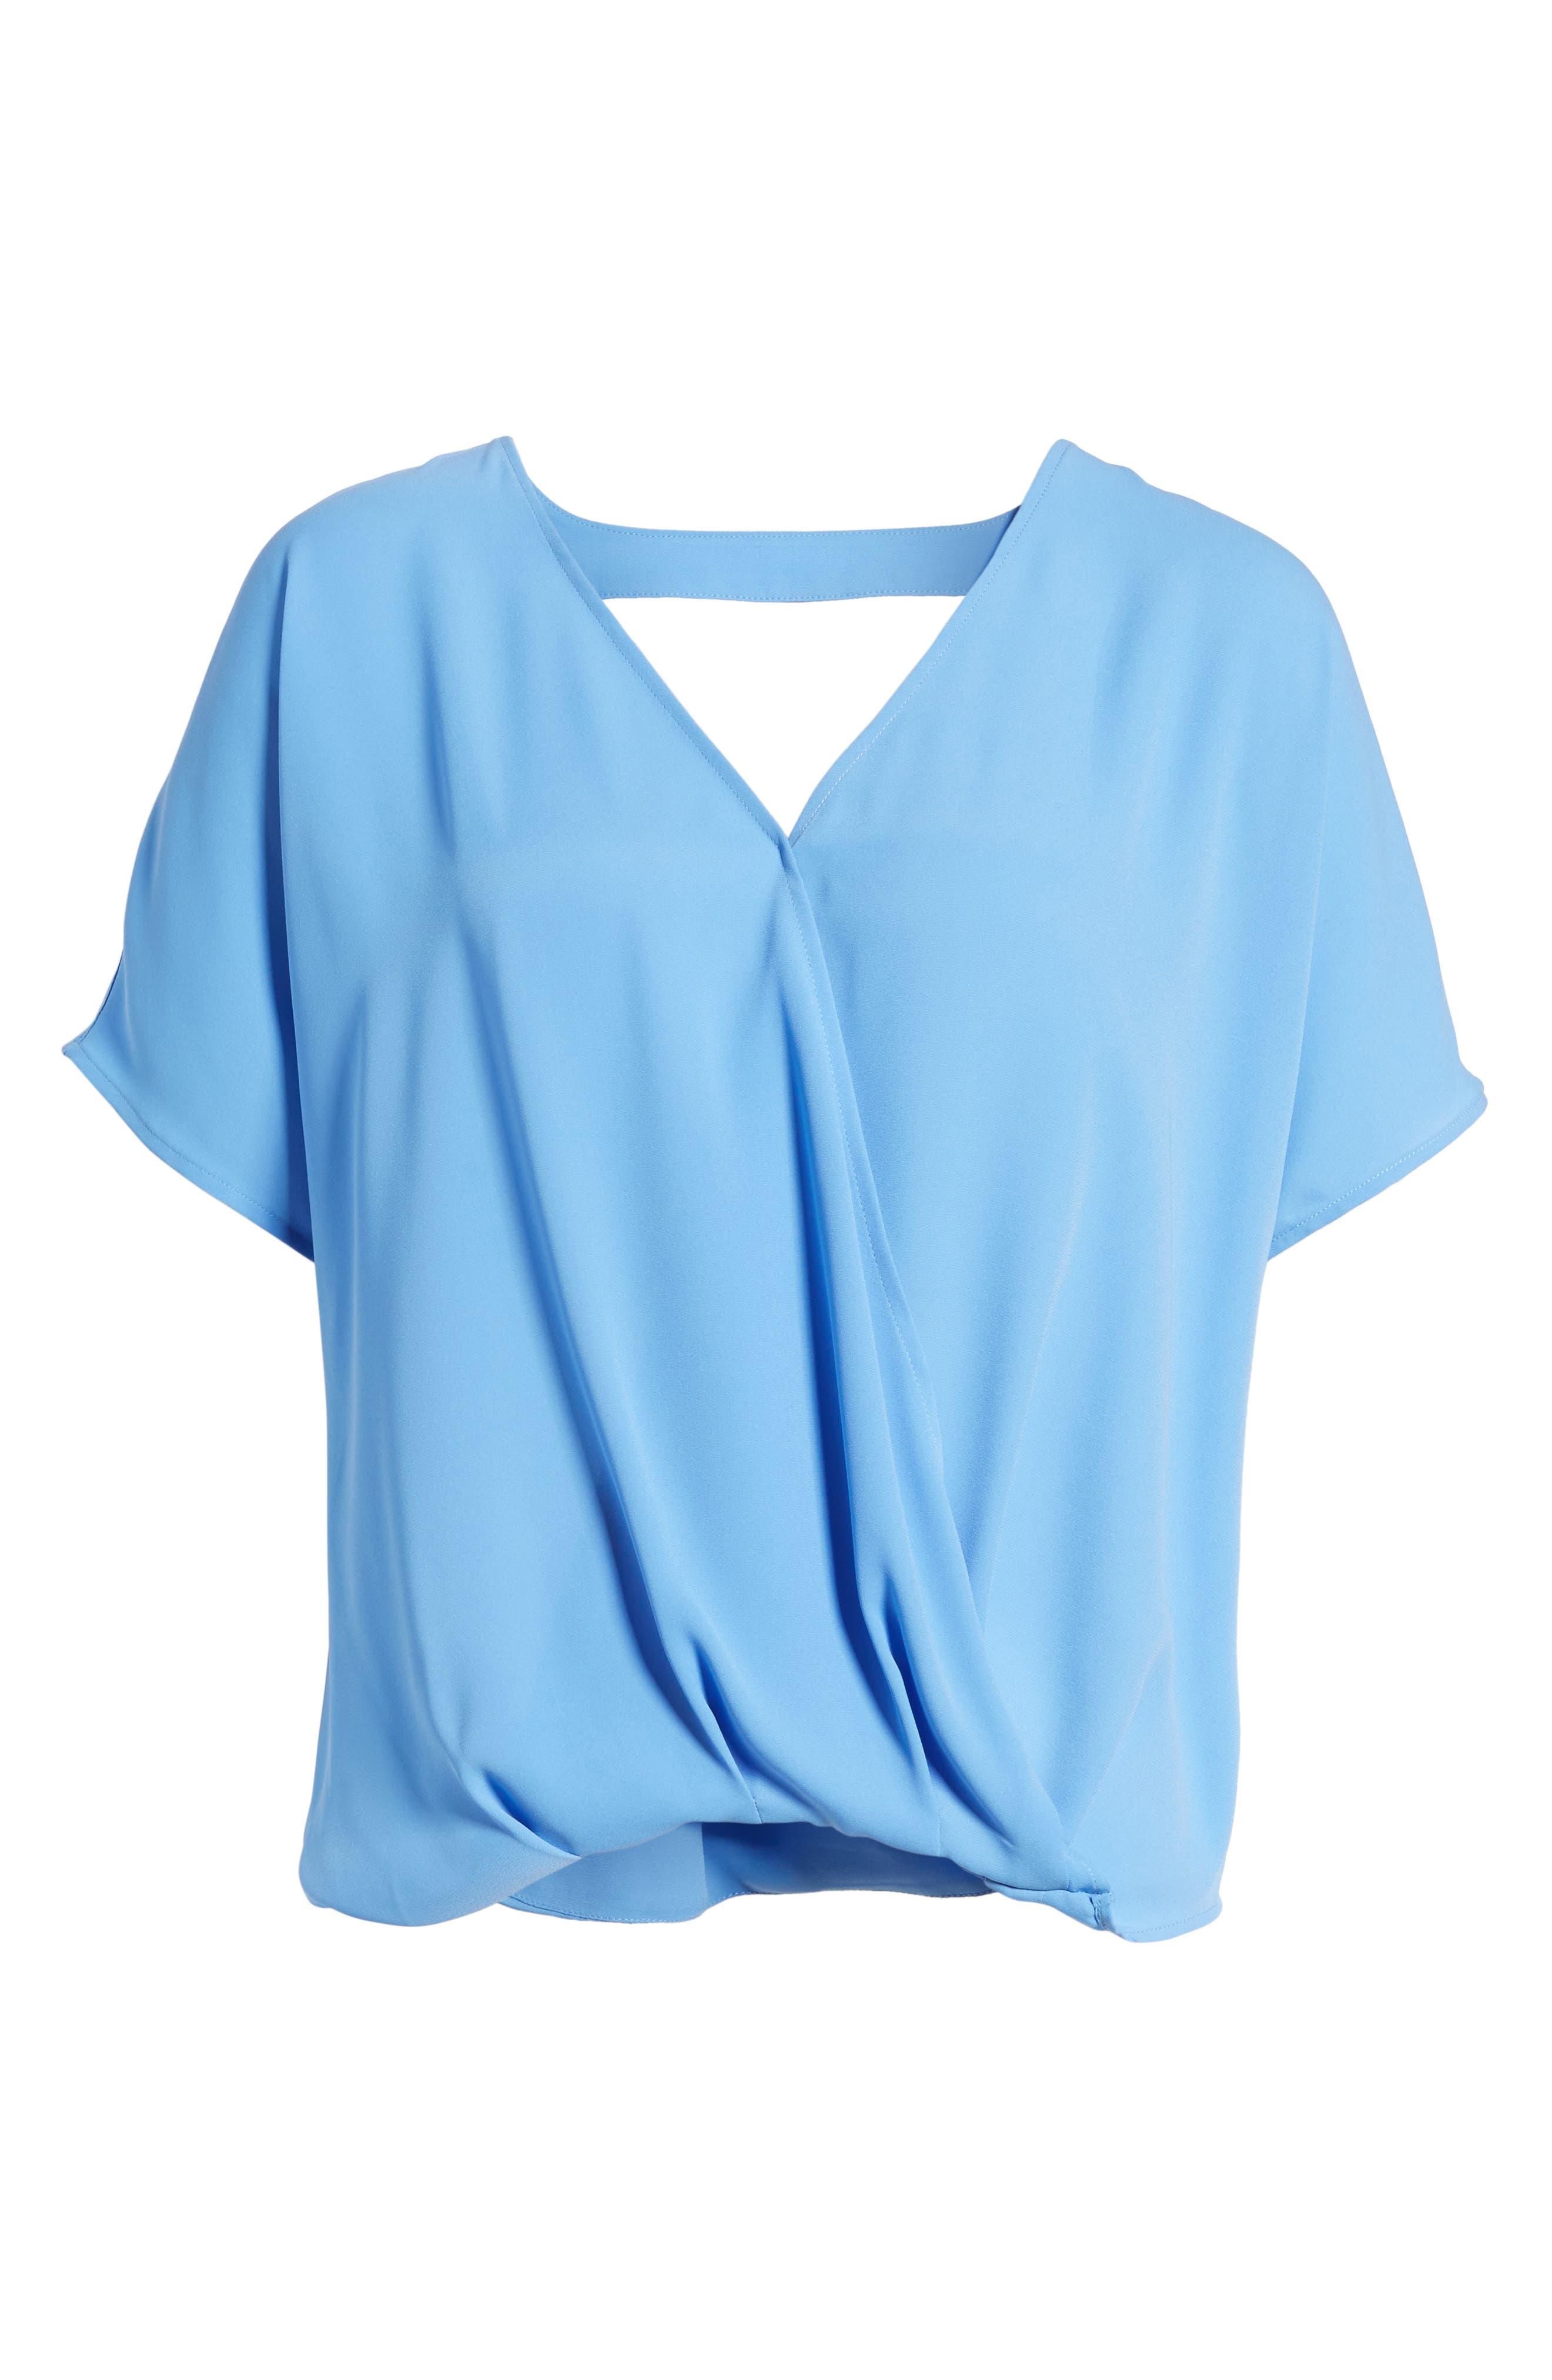 Surplice Top,                             Alternate thumbnail 5, color,                             Blue Azurite